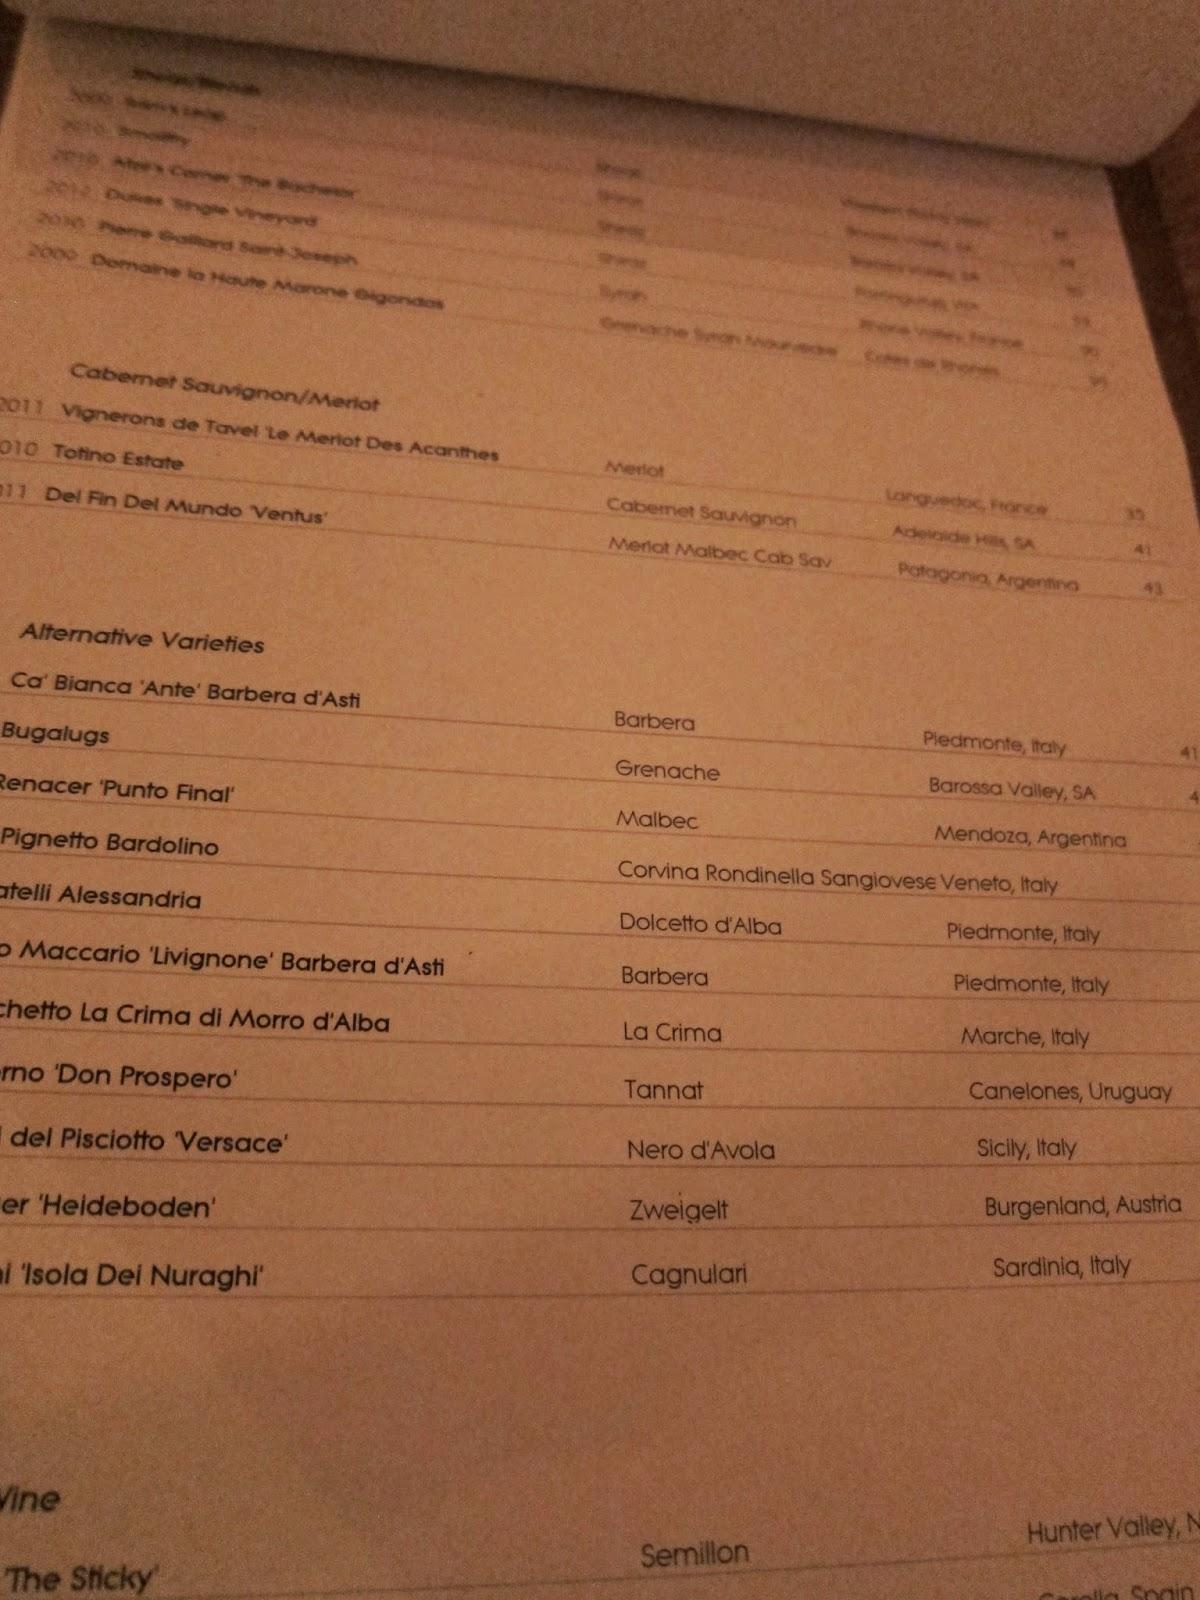 banter wine bar drinks menu image red wine